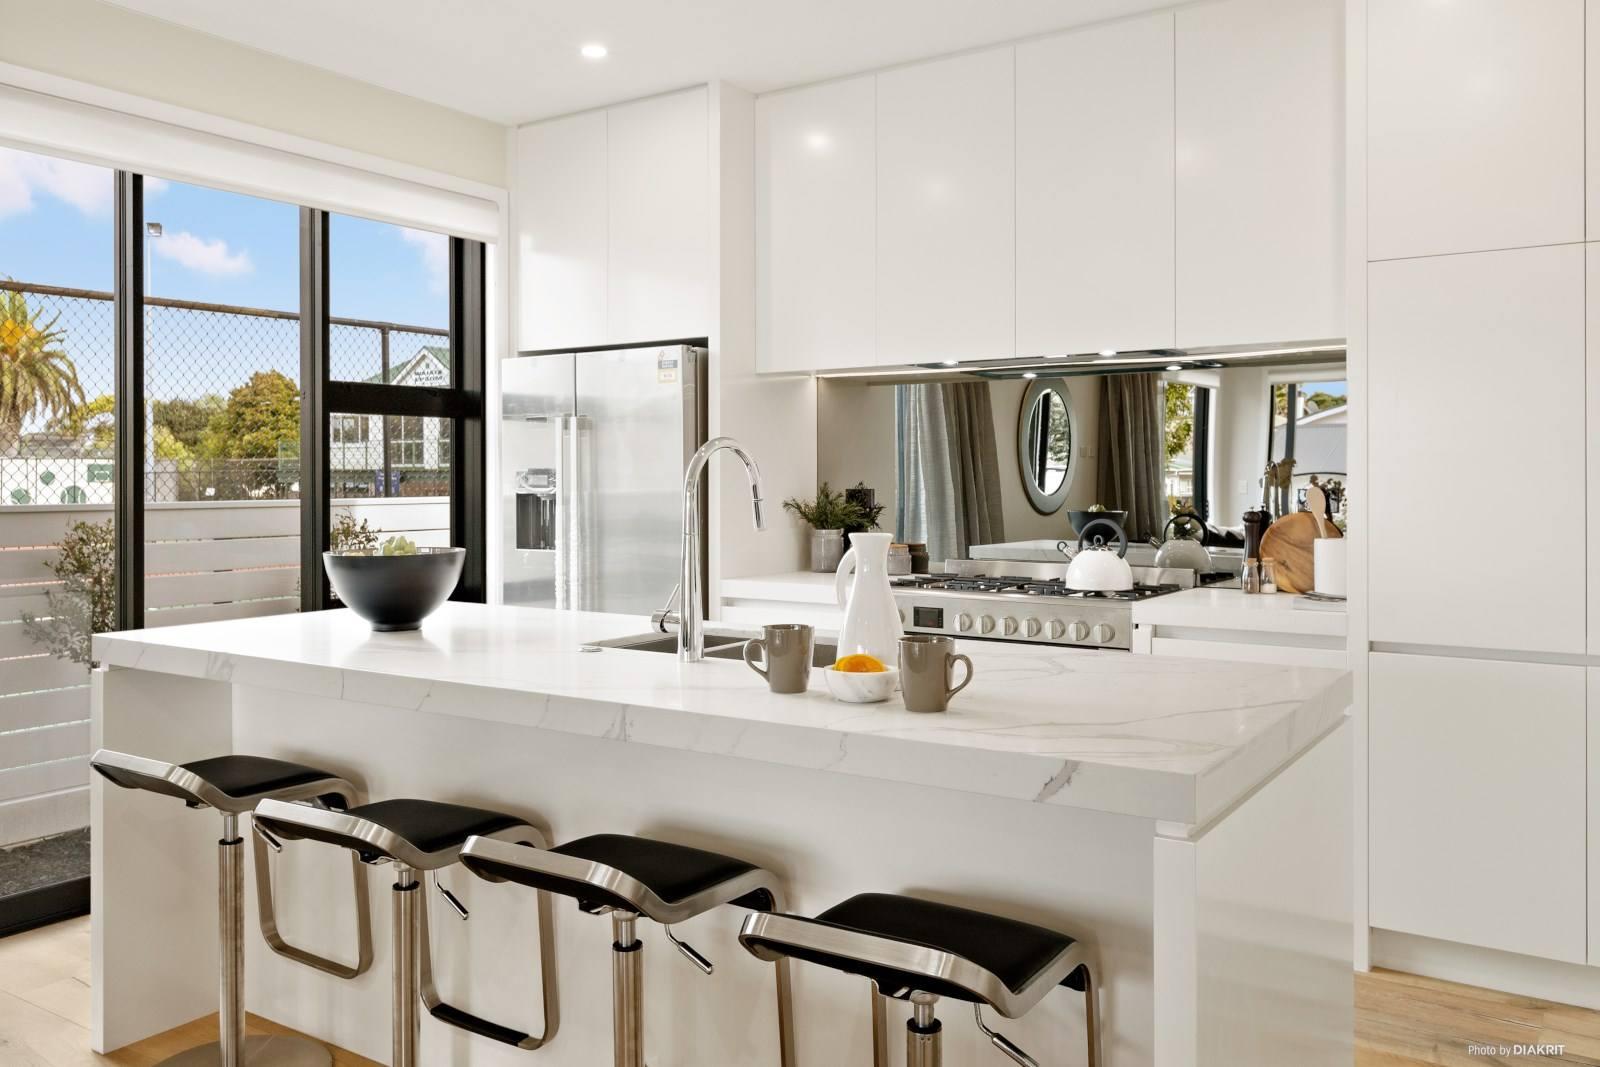 Epsom 5房 全新精品闪耀上市 智能家居保驾护航 细节彰显无暇品质 成为它的第一位主人! Brand New Home - What A Stunner !